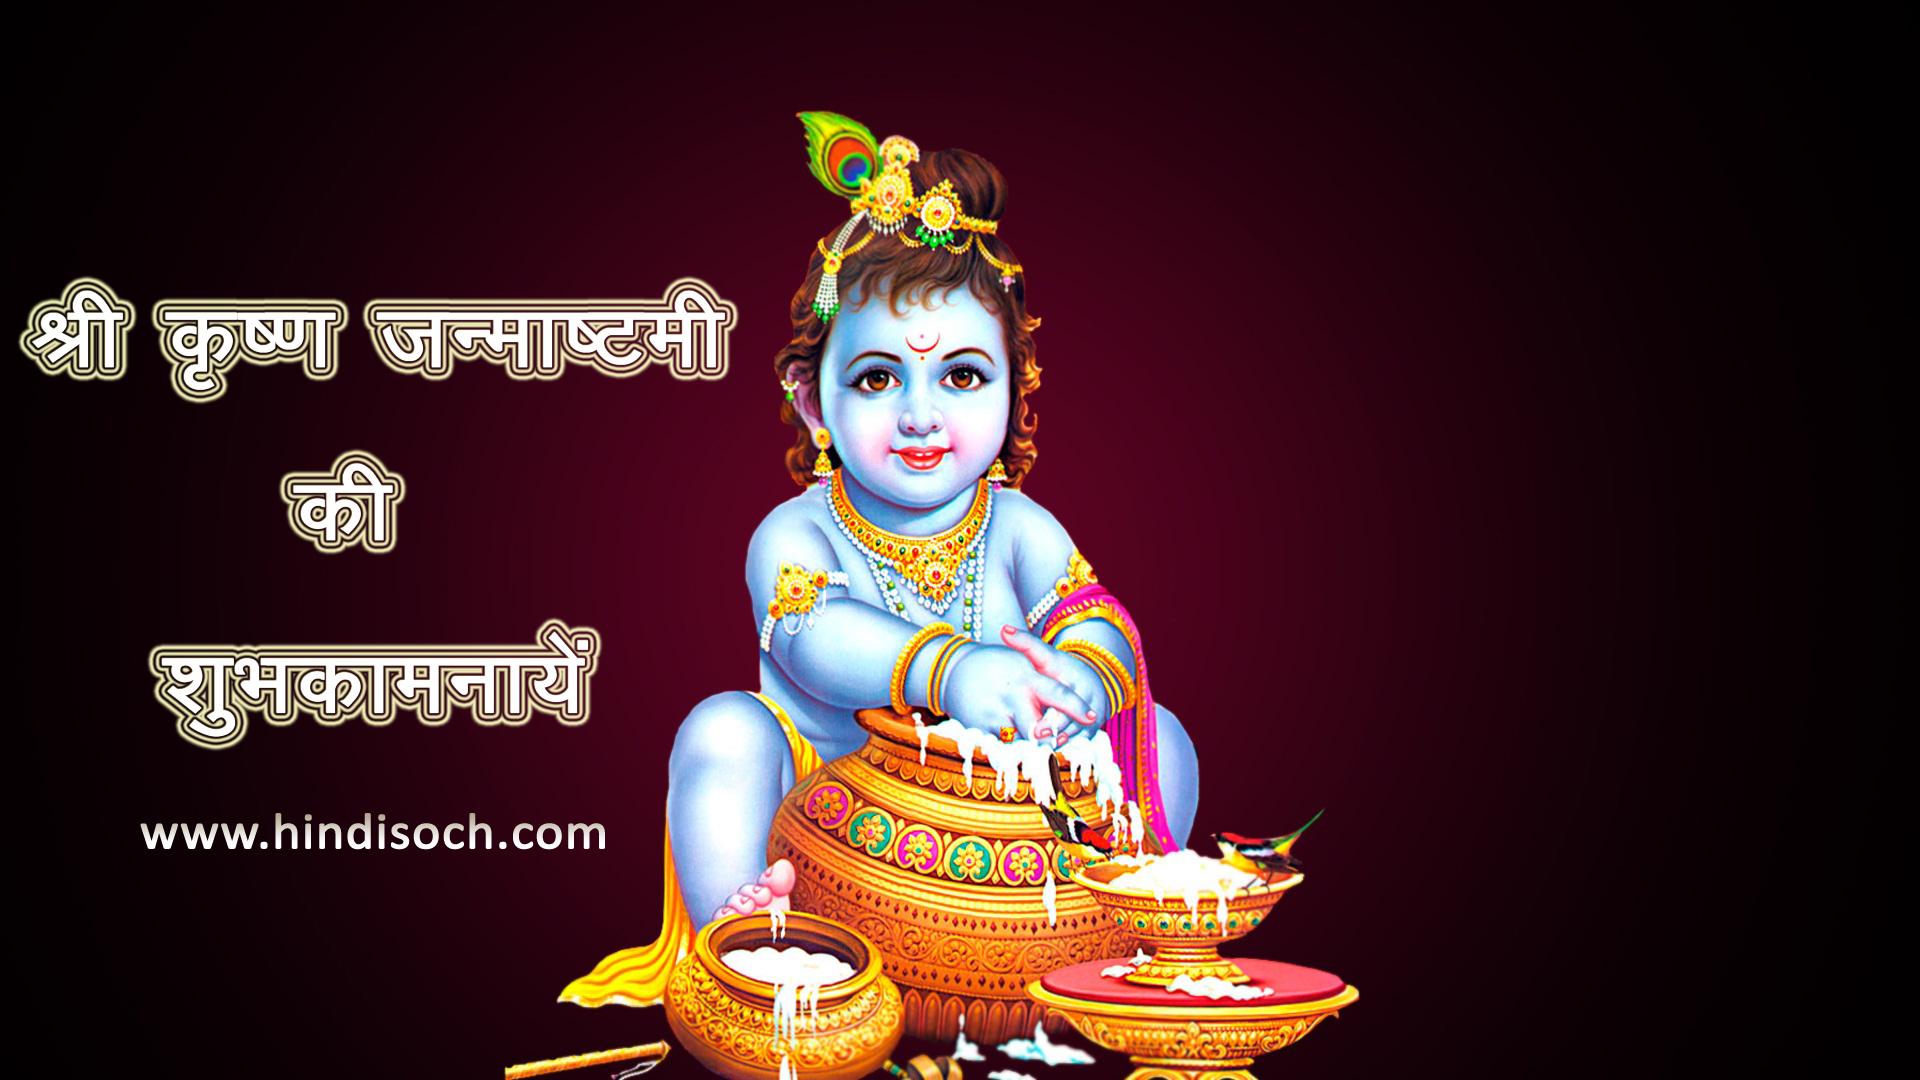 Lord shree bal krishna wallpaper beautiful hd wallpaper - Janmashtami Images Wallpapers